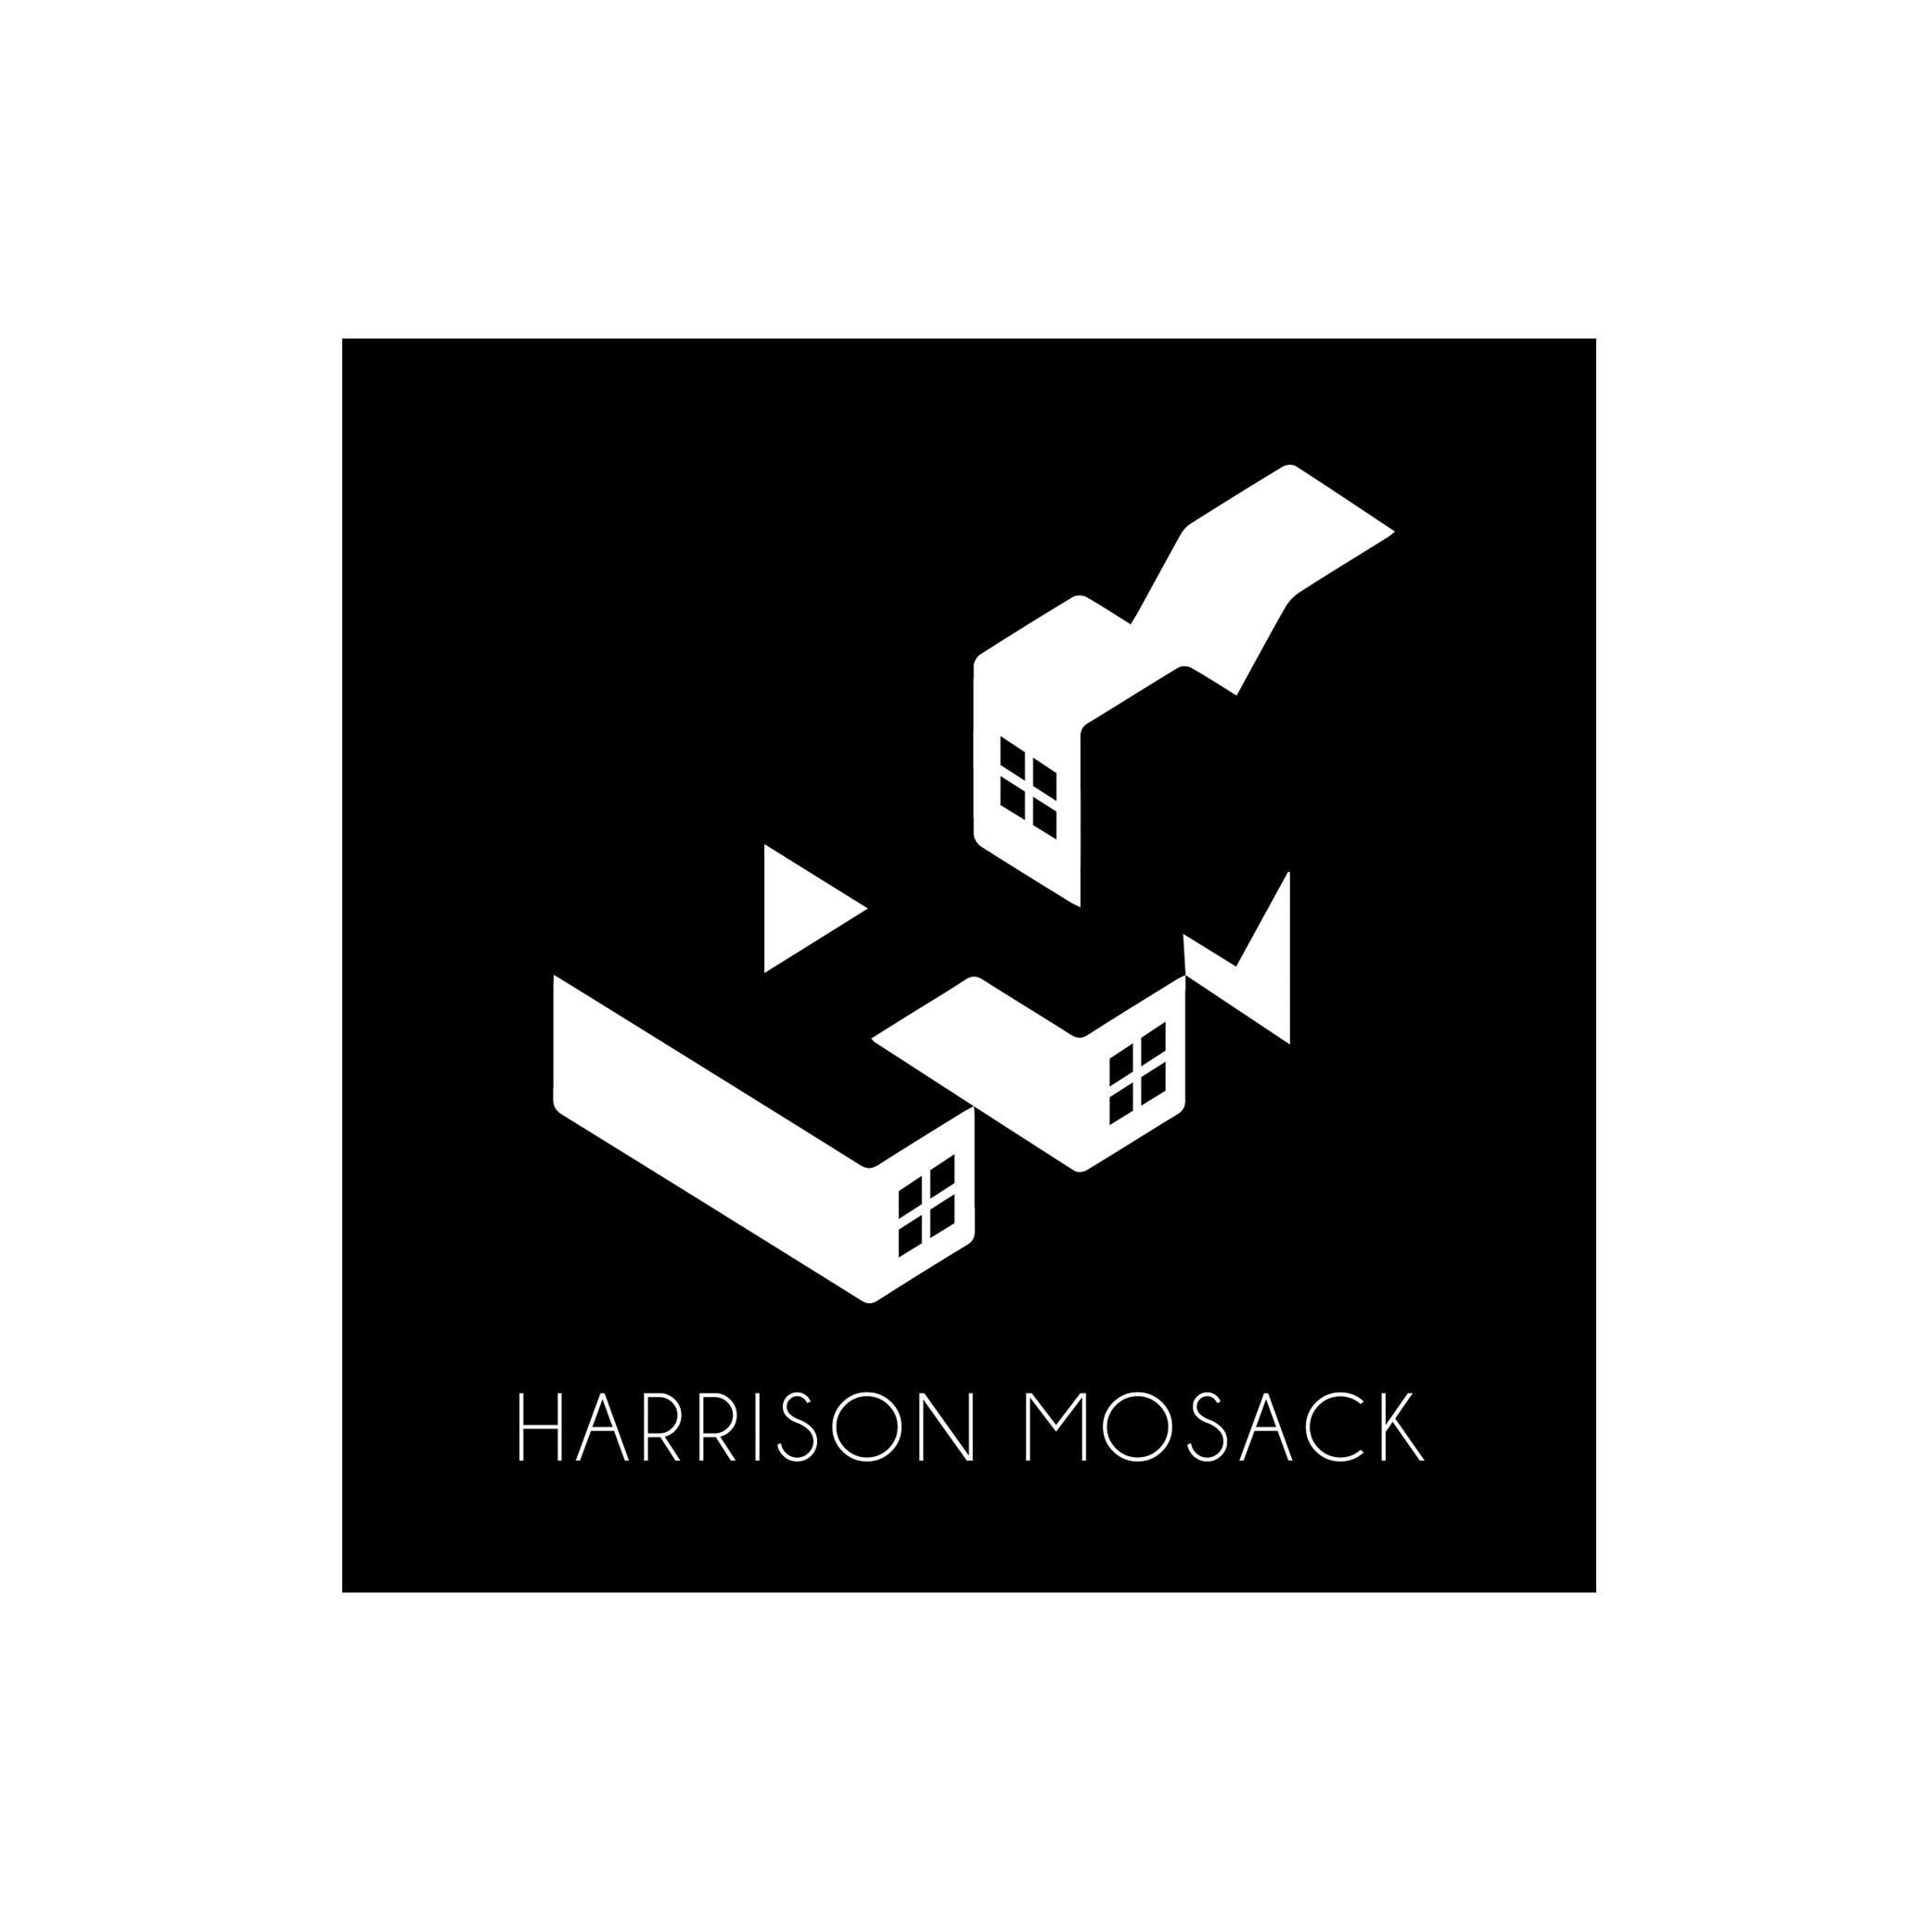 Harrison Mosack